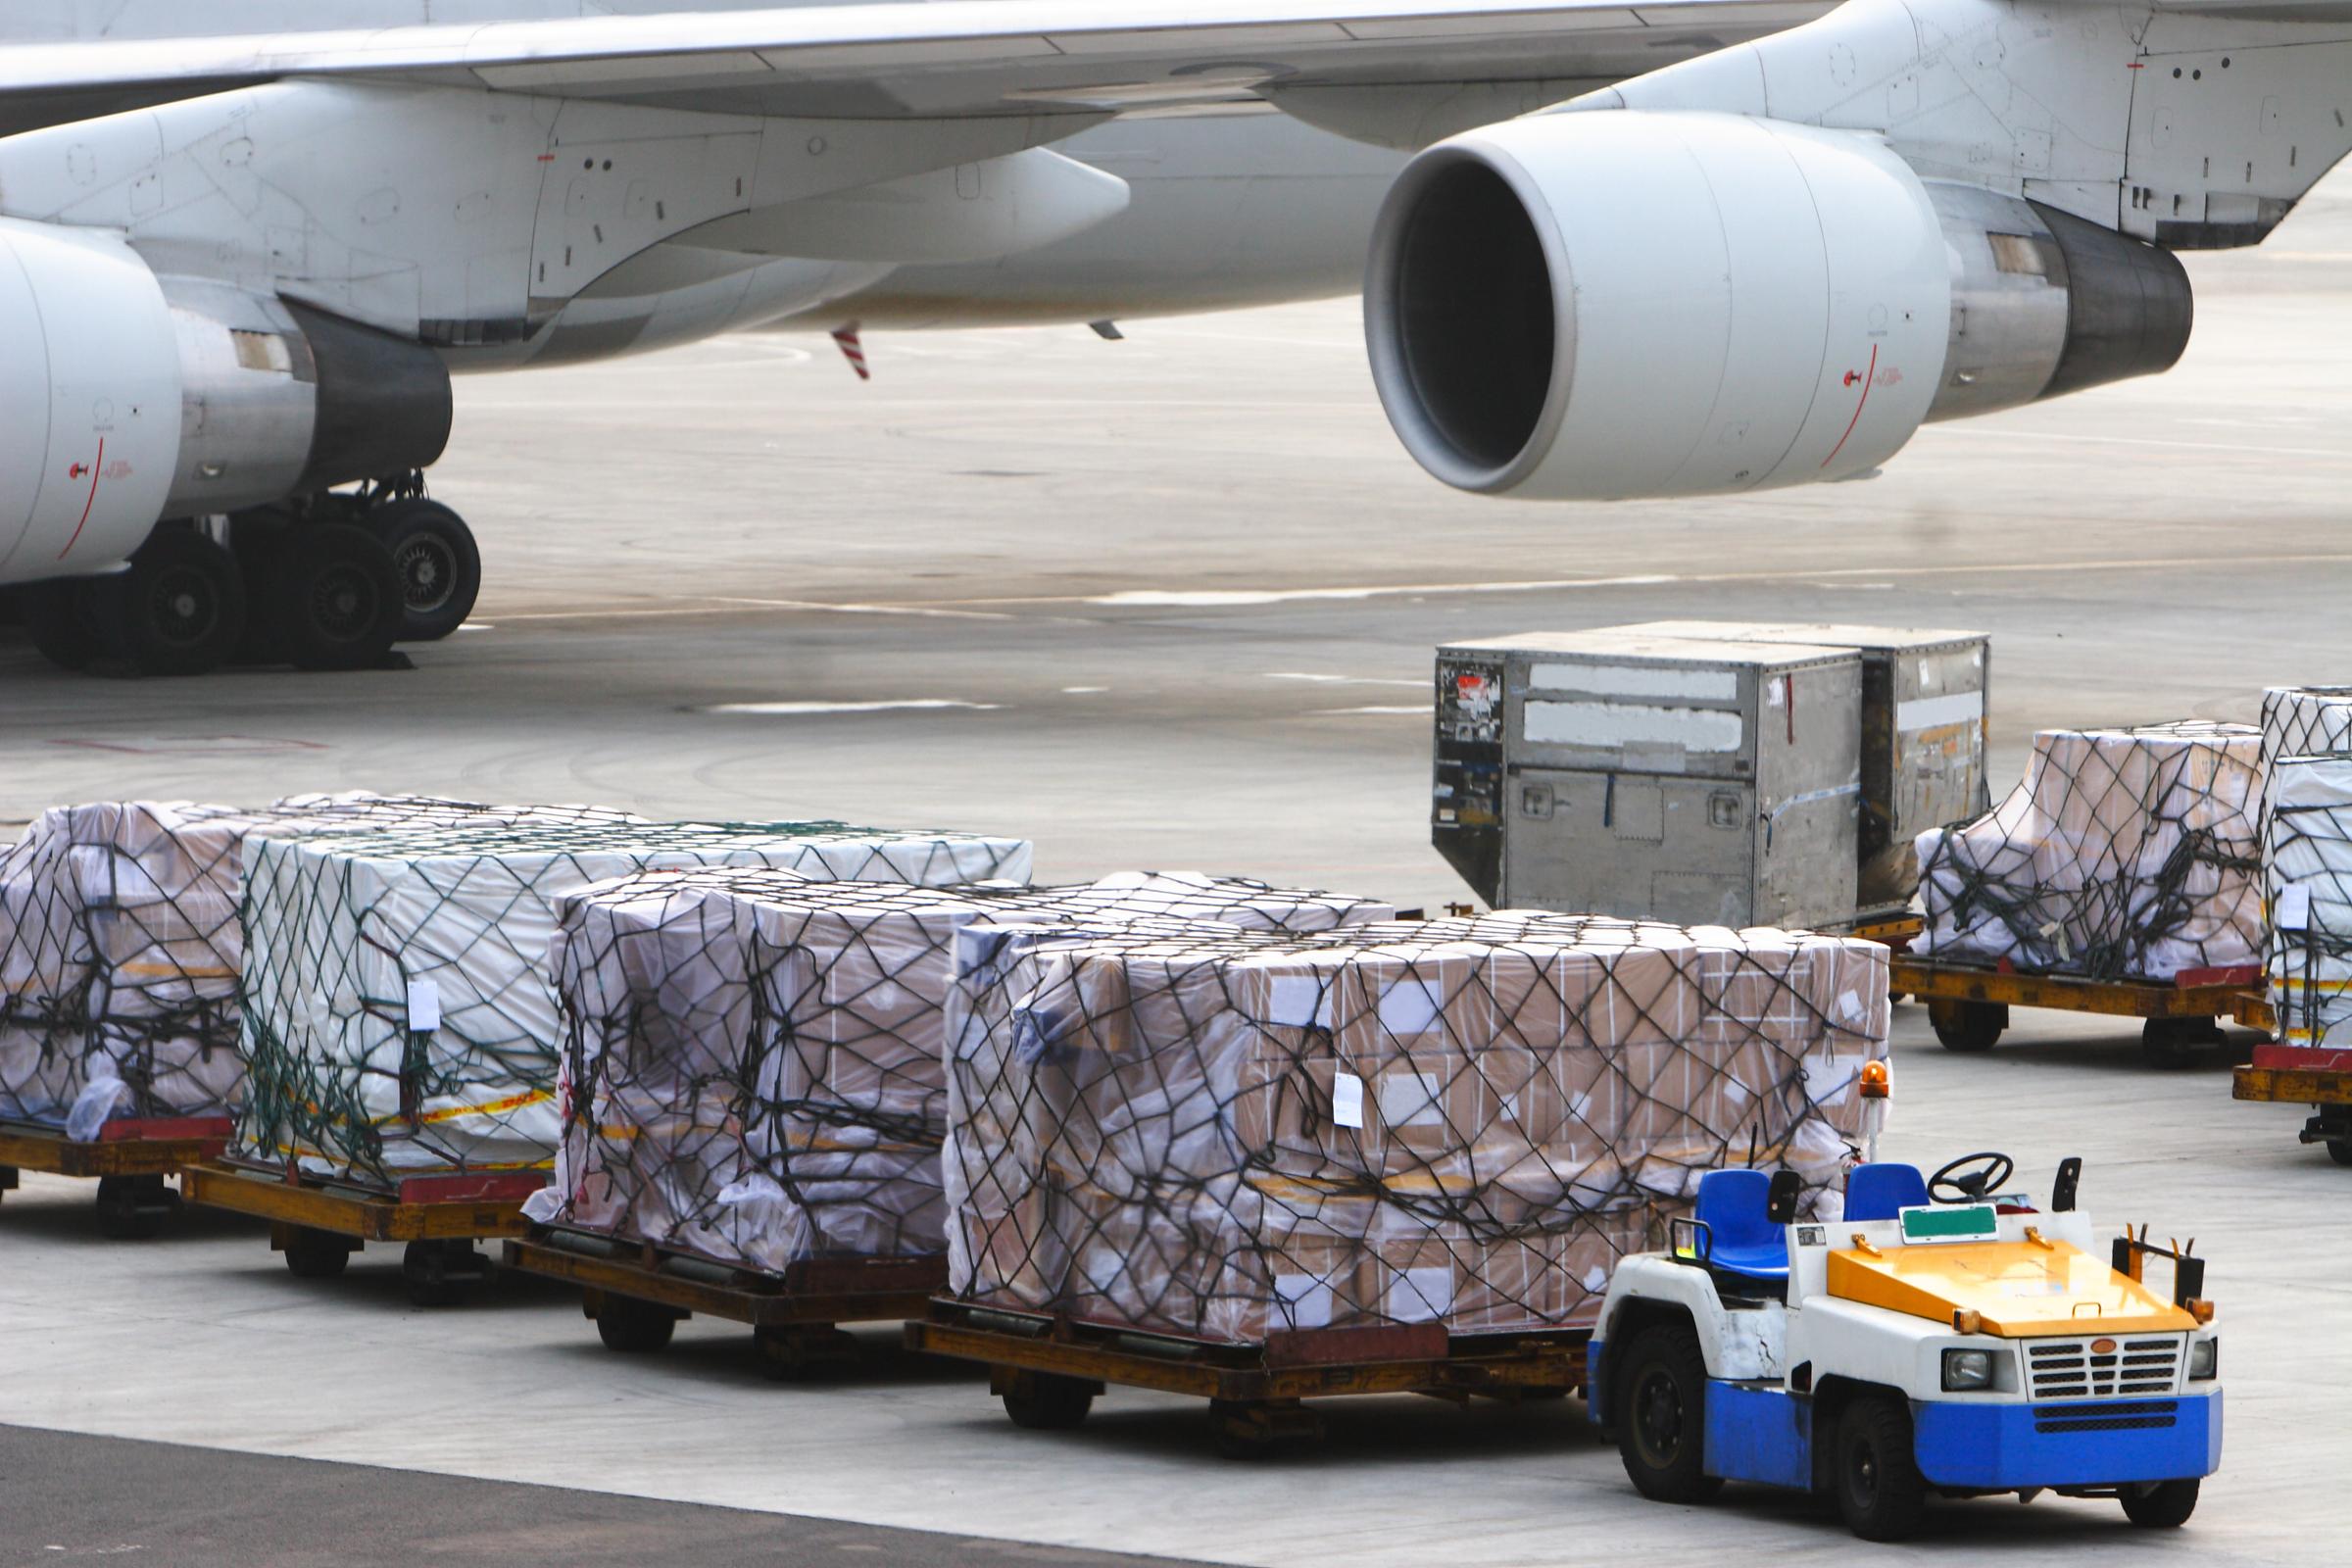 sang-lei-air-cargo_24200475